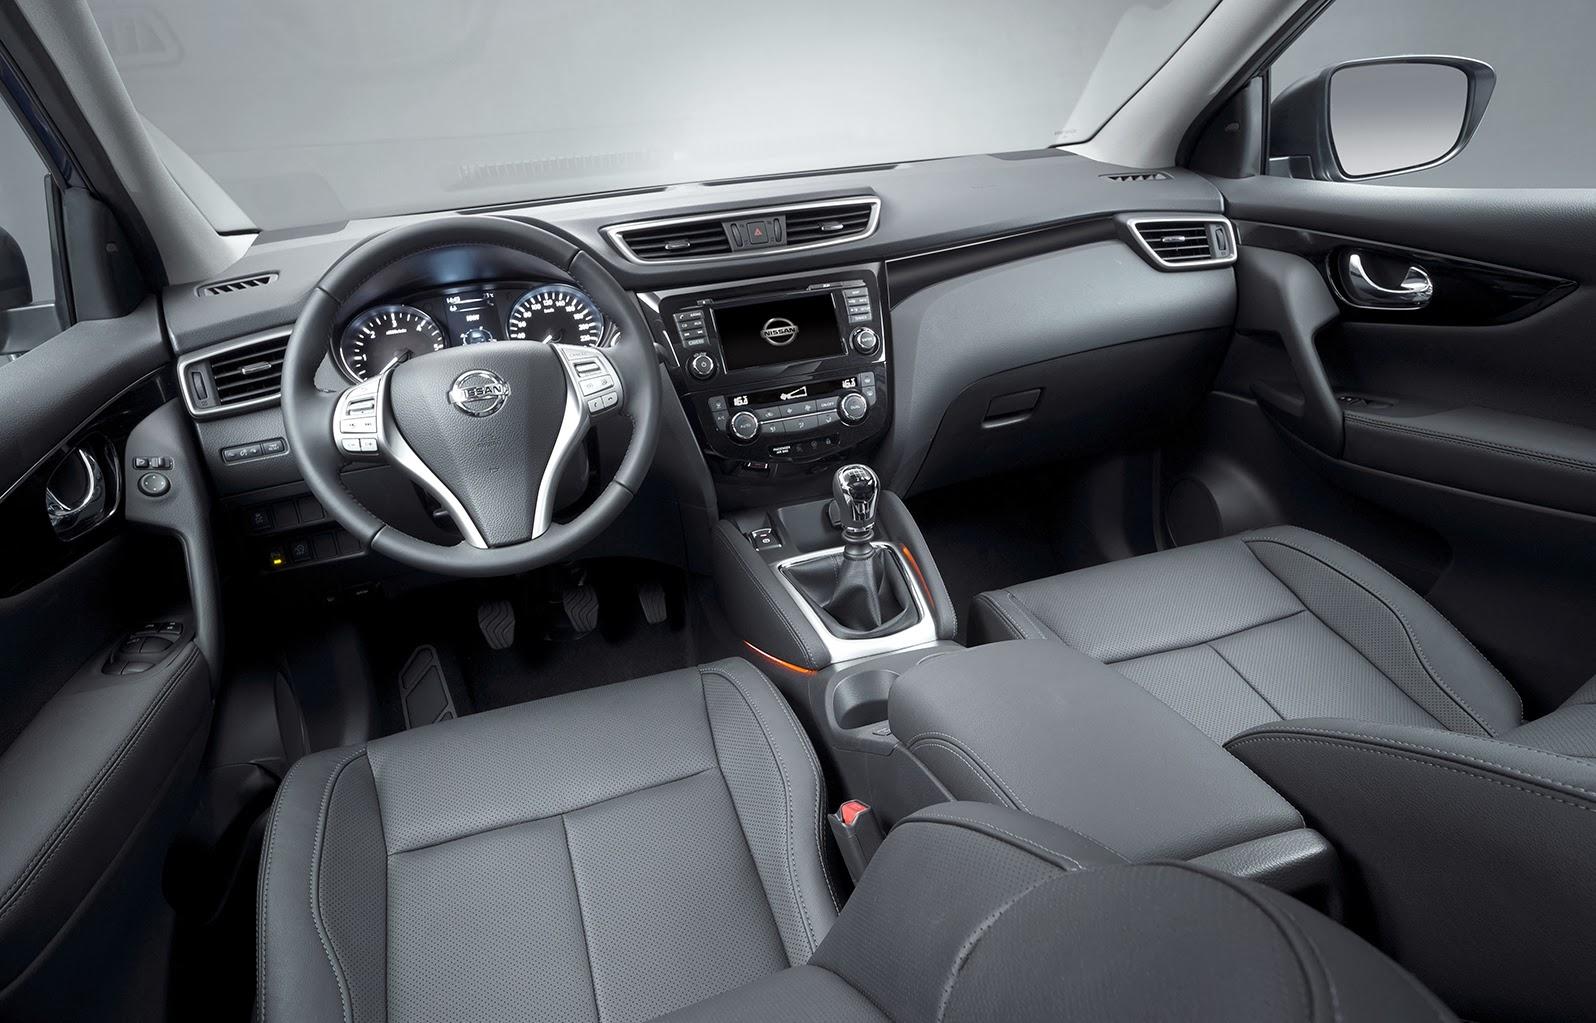 Novo nissan qasqai 2014 chega europa car blog br for Nissan qashqai 2014 interior